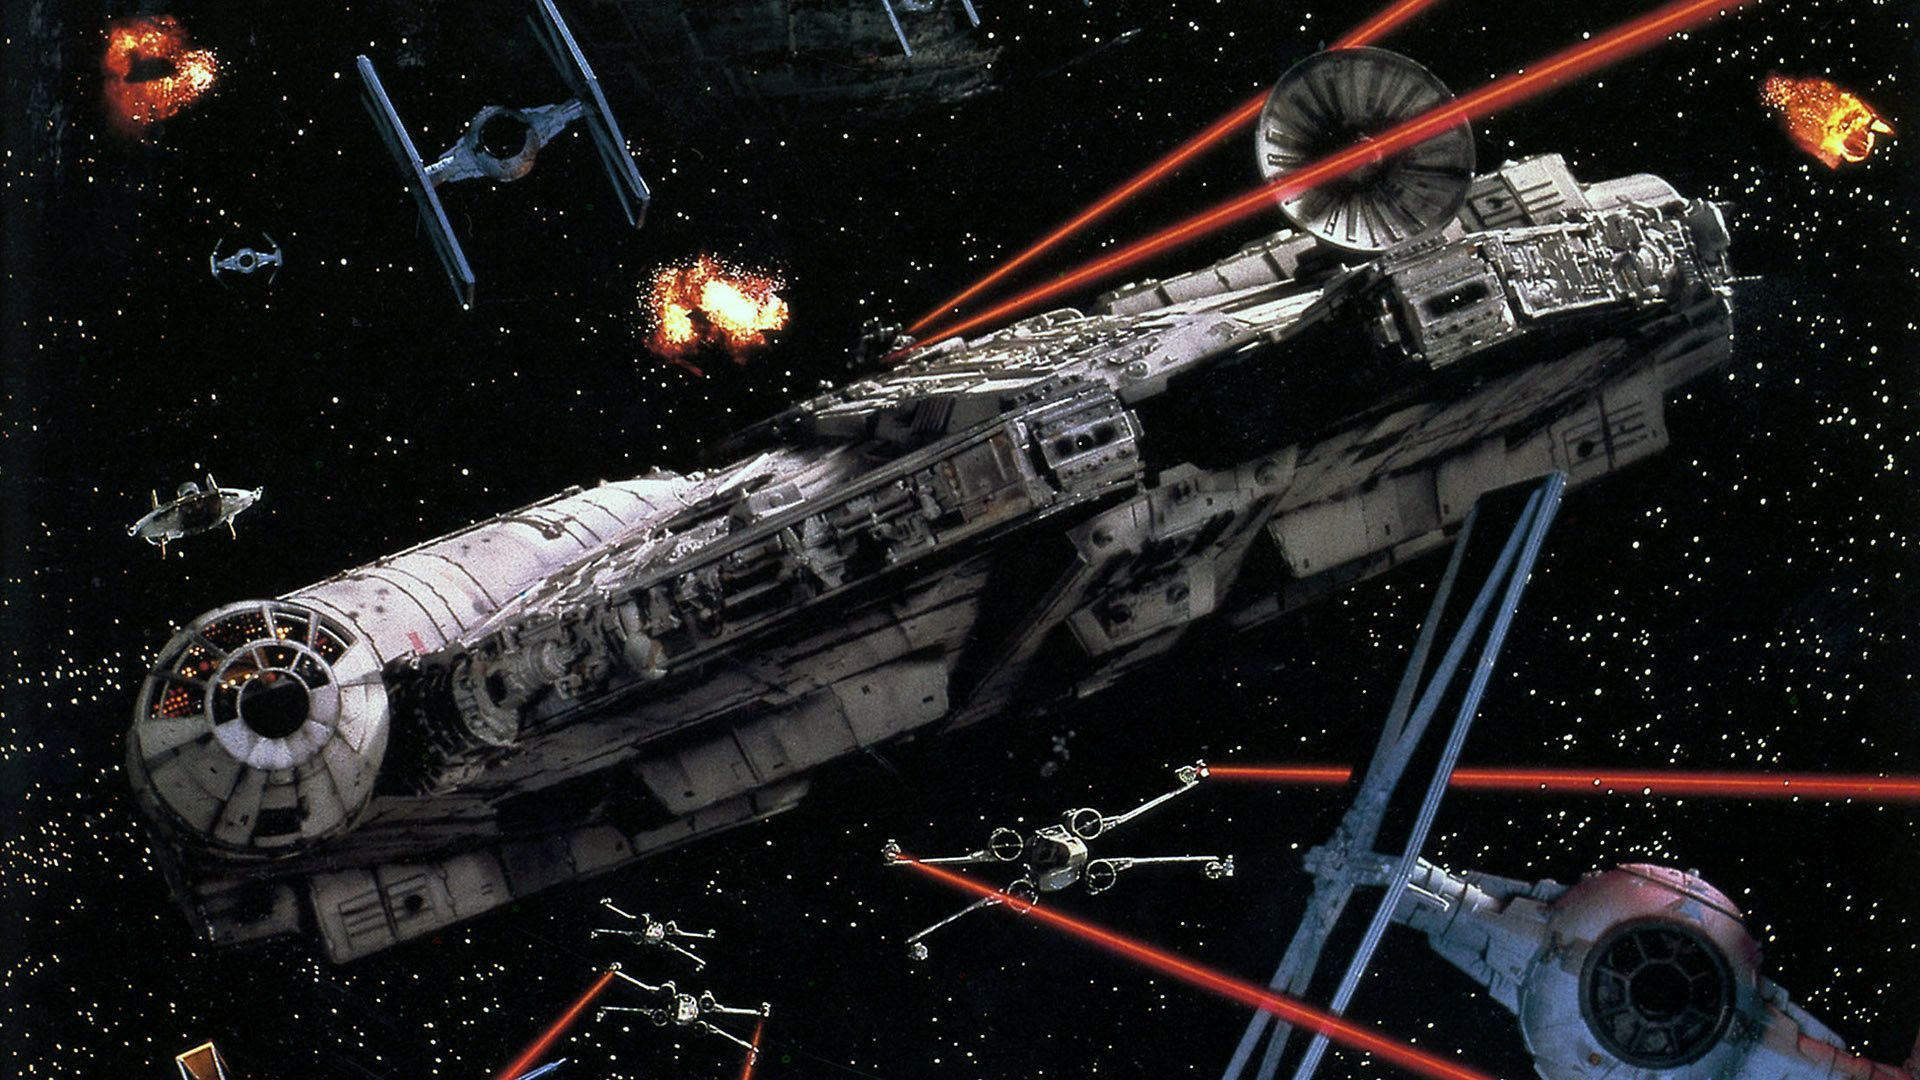 Http Rstvideo Com Trailer Files 2011 10 Star Wars Episode Vi Return Of The Jedi3 Jpg Star Wars Wallpaper Star Wars Ships Star Wars Spaceships